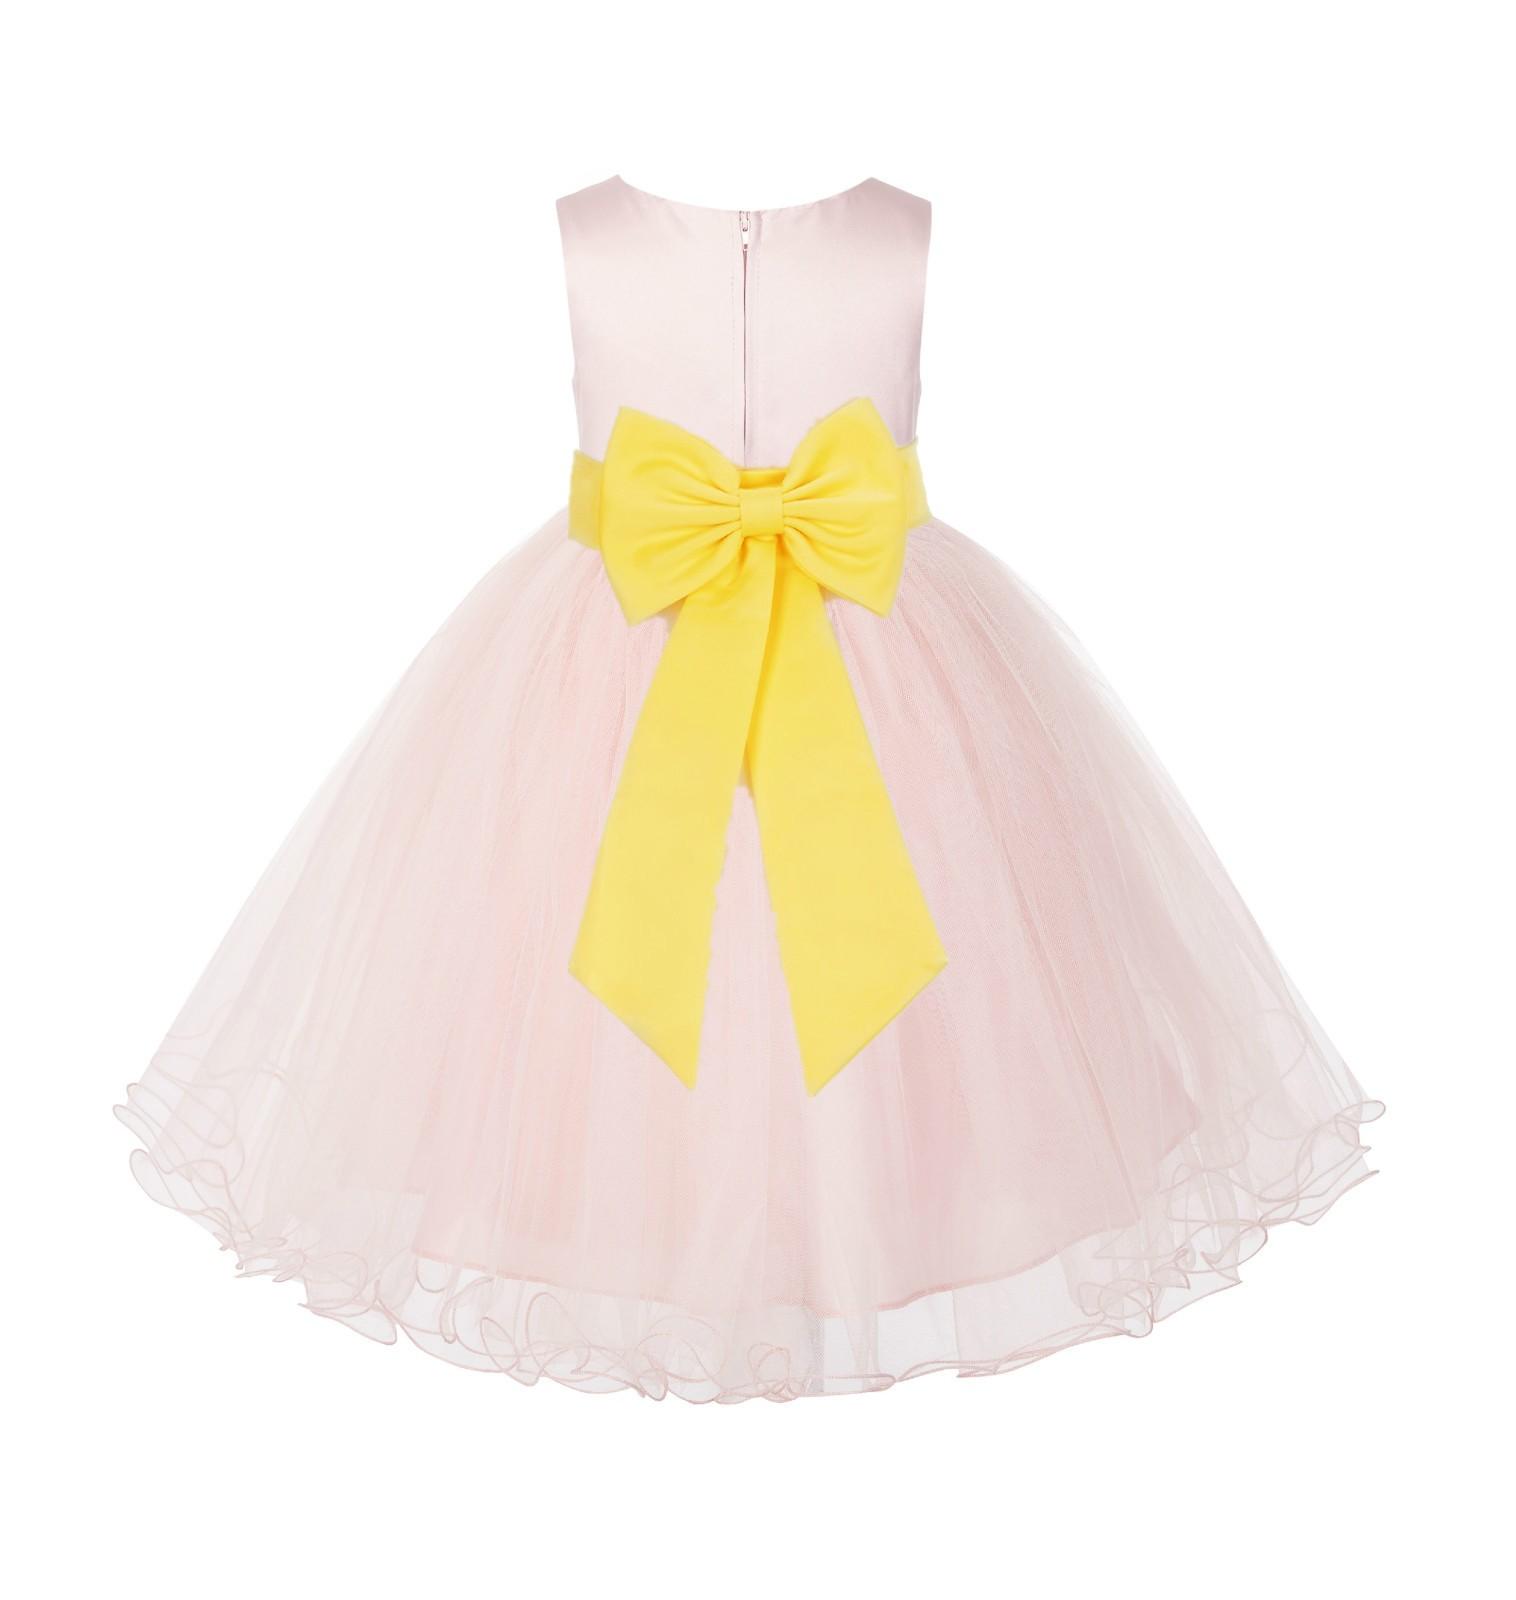 Blush PInk / Sunbeam Tulle Rattail Edge Flower Girl Dress Wedding Bridesmaid 829T